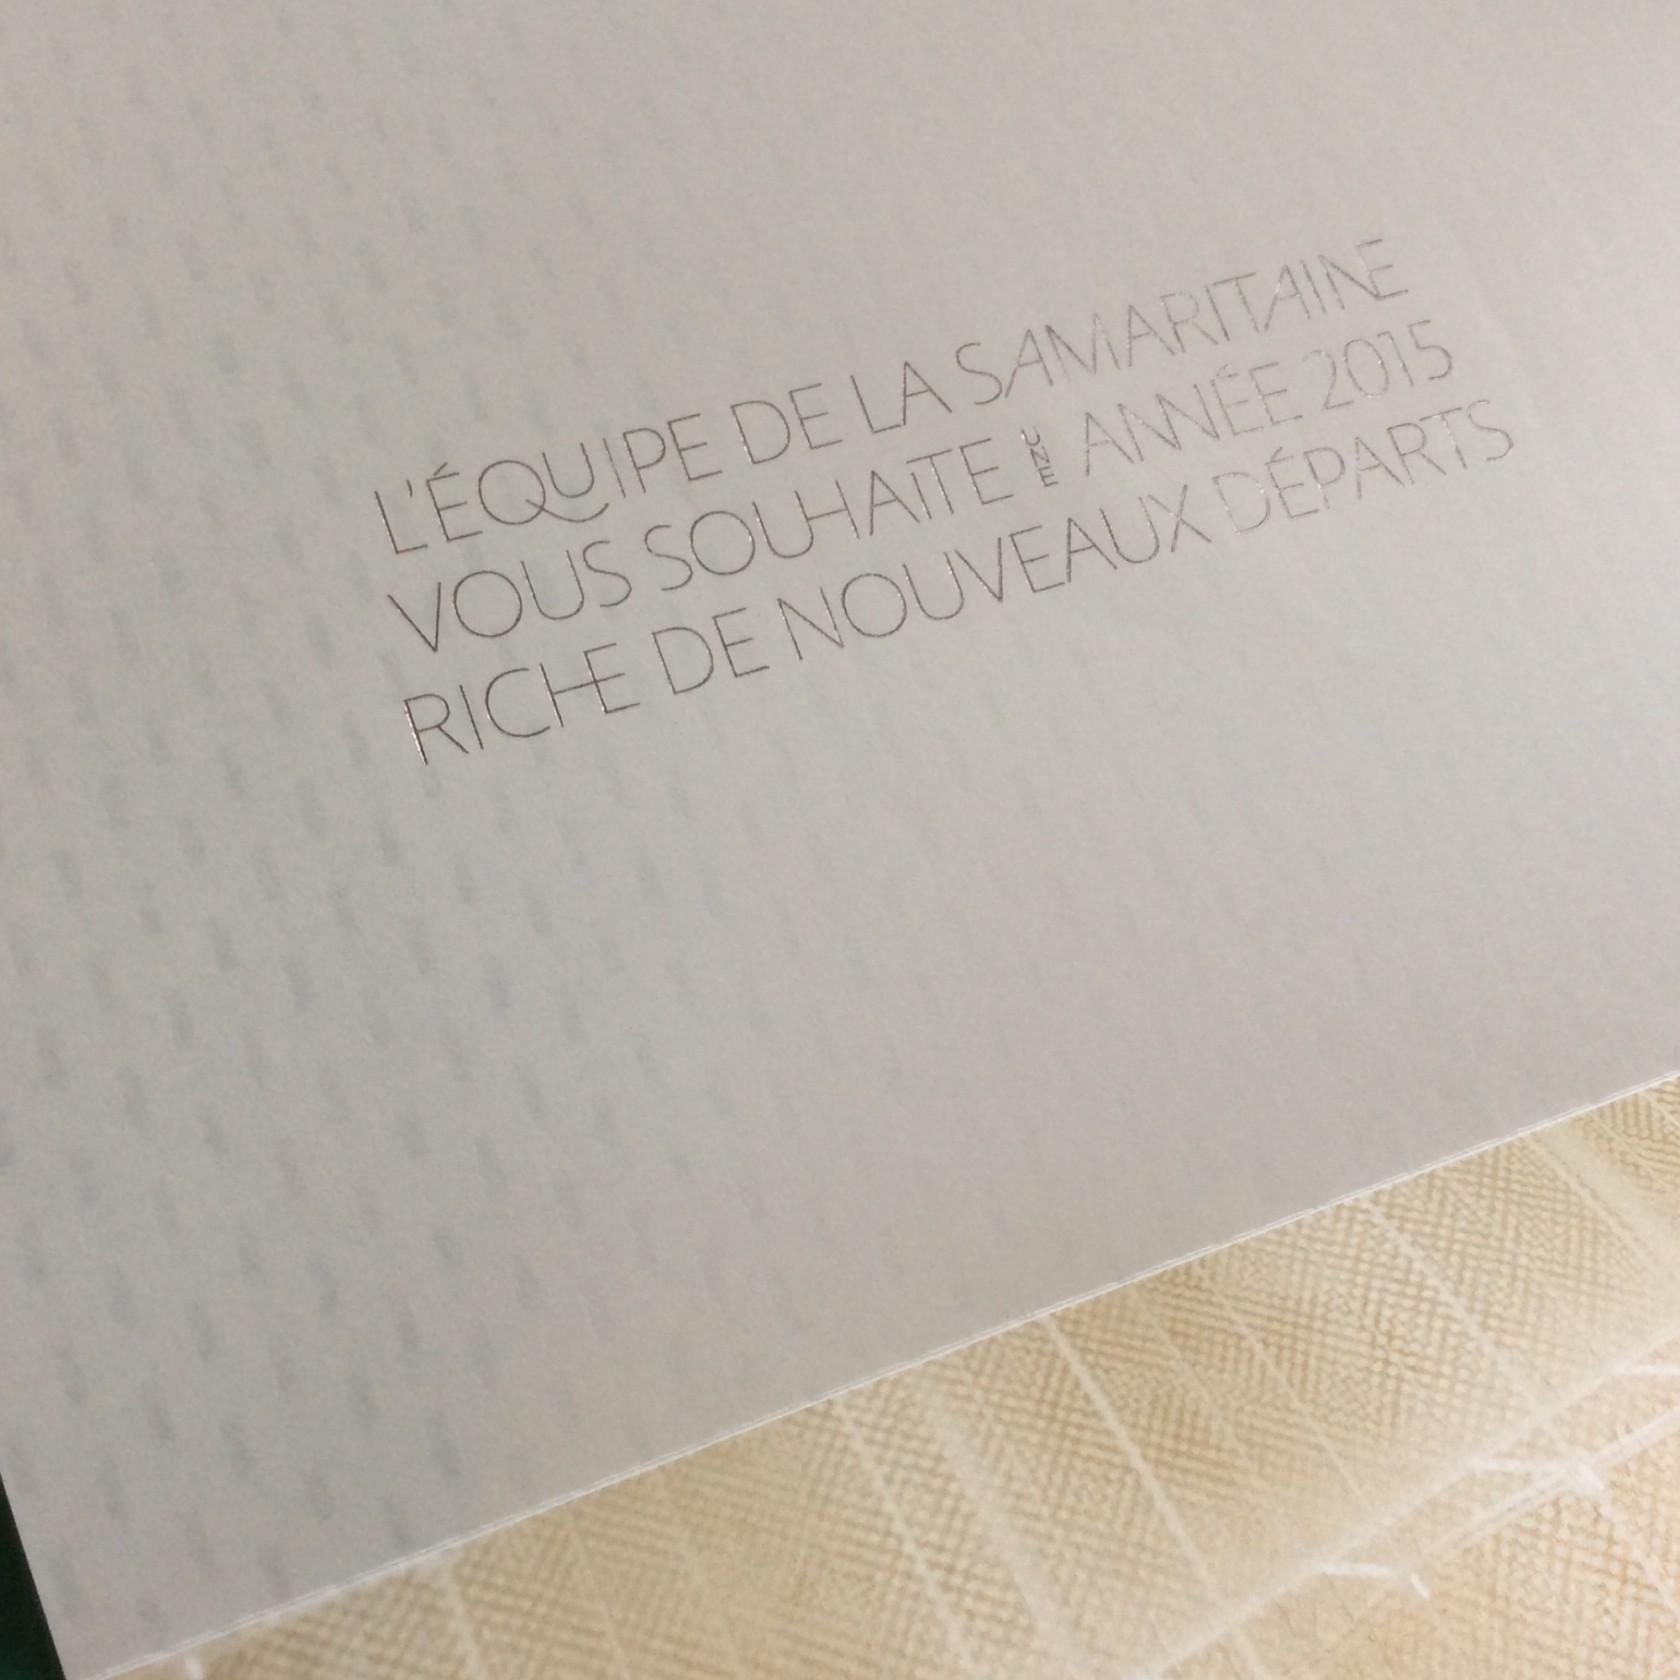 fouinzanardi -  fz_print_rp_com_samaritaine_voeux2